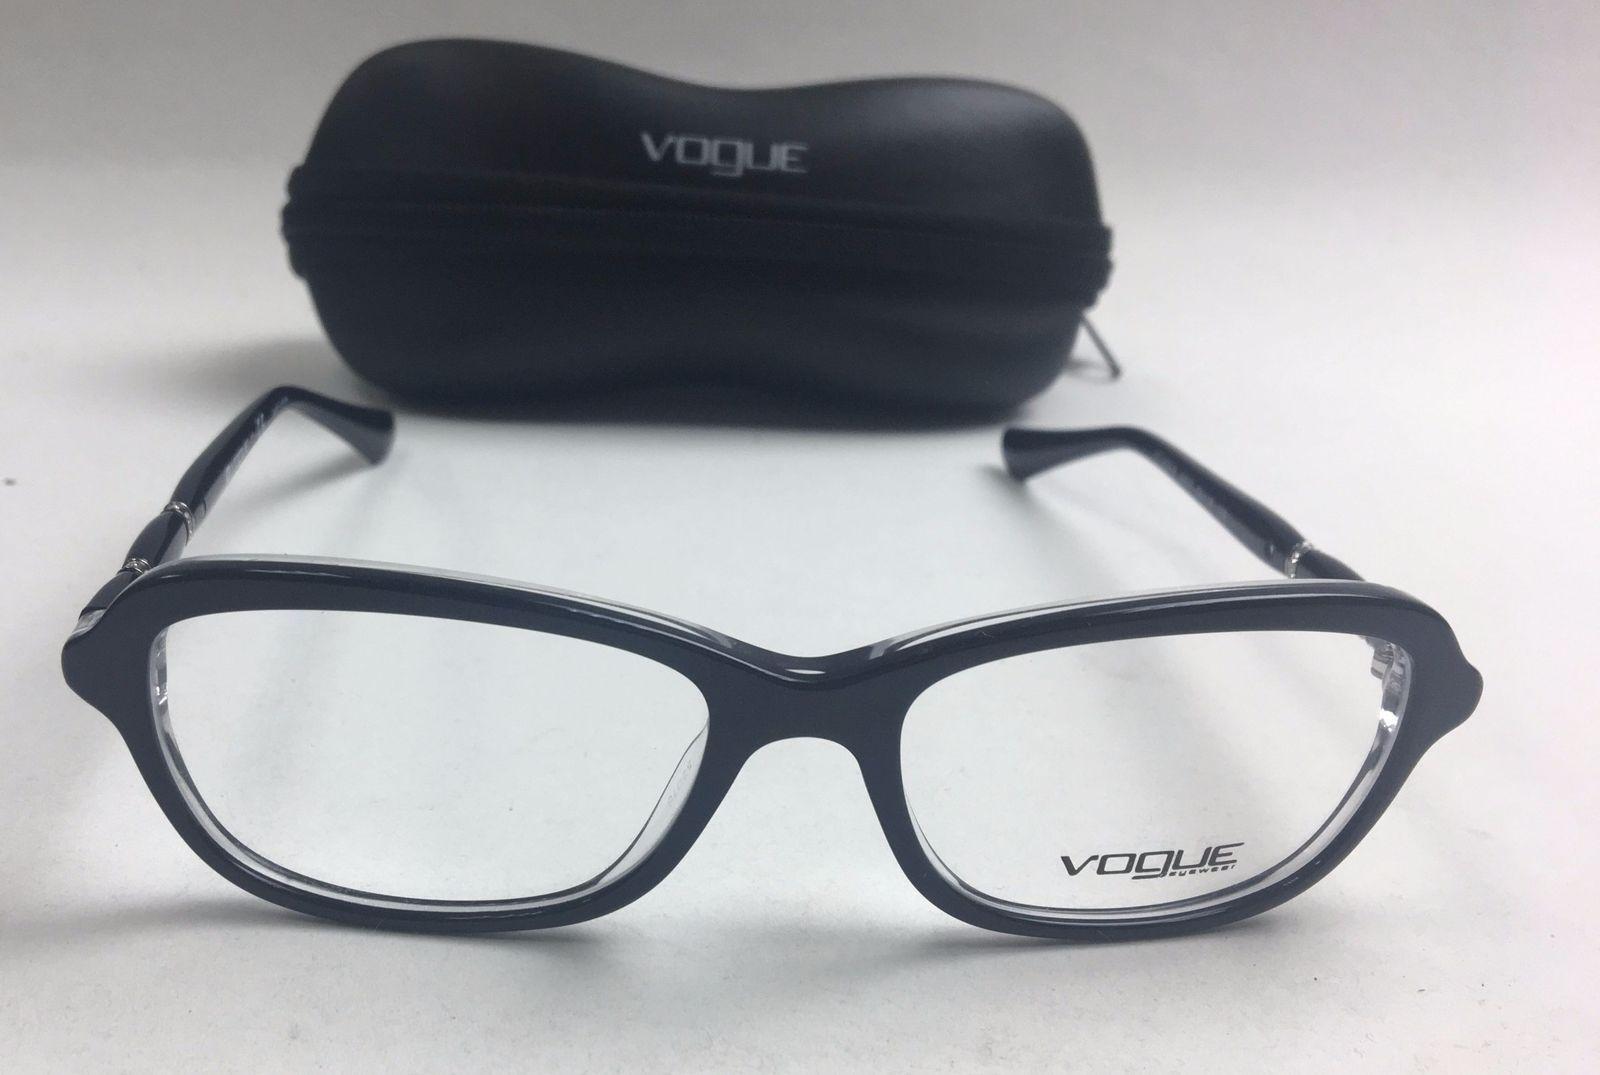 1e50a1a0988 Vogue VO2999-B W827 Women s Eyeglasses 52 16 and 50 similar items